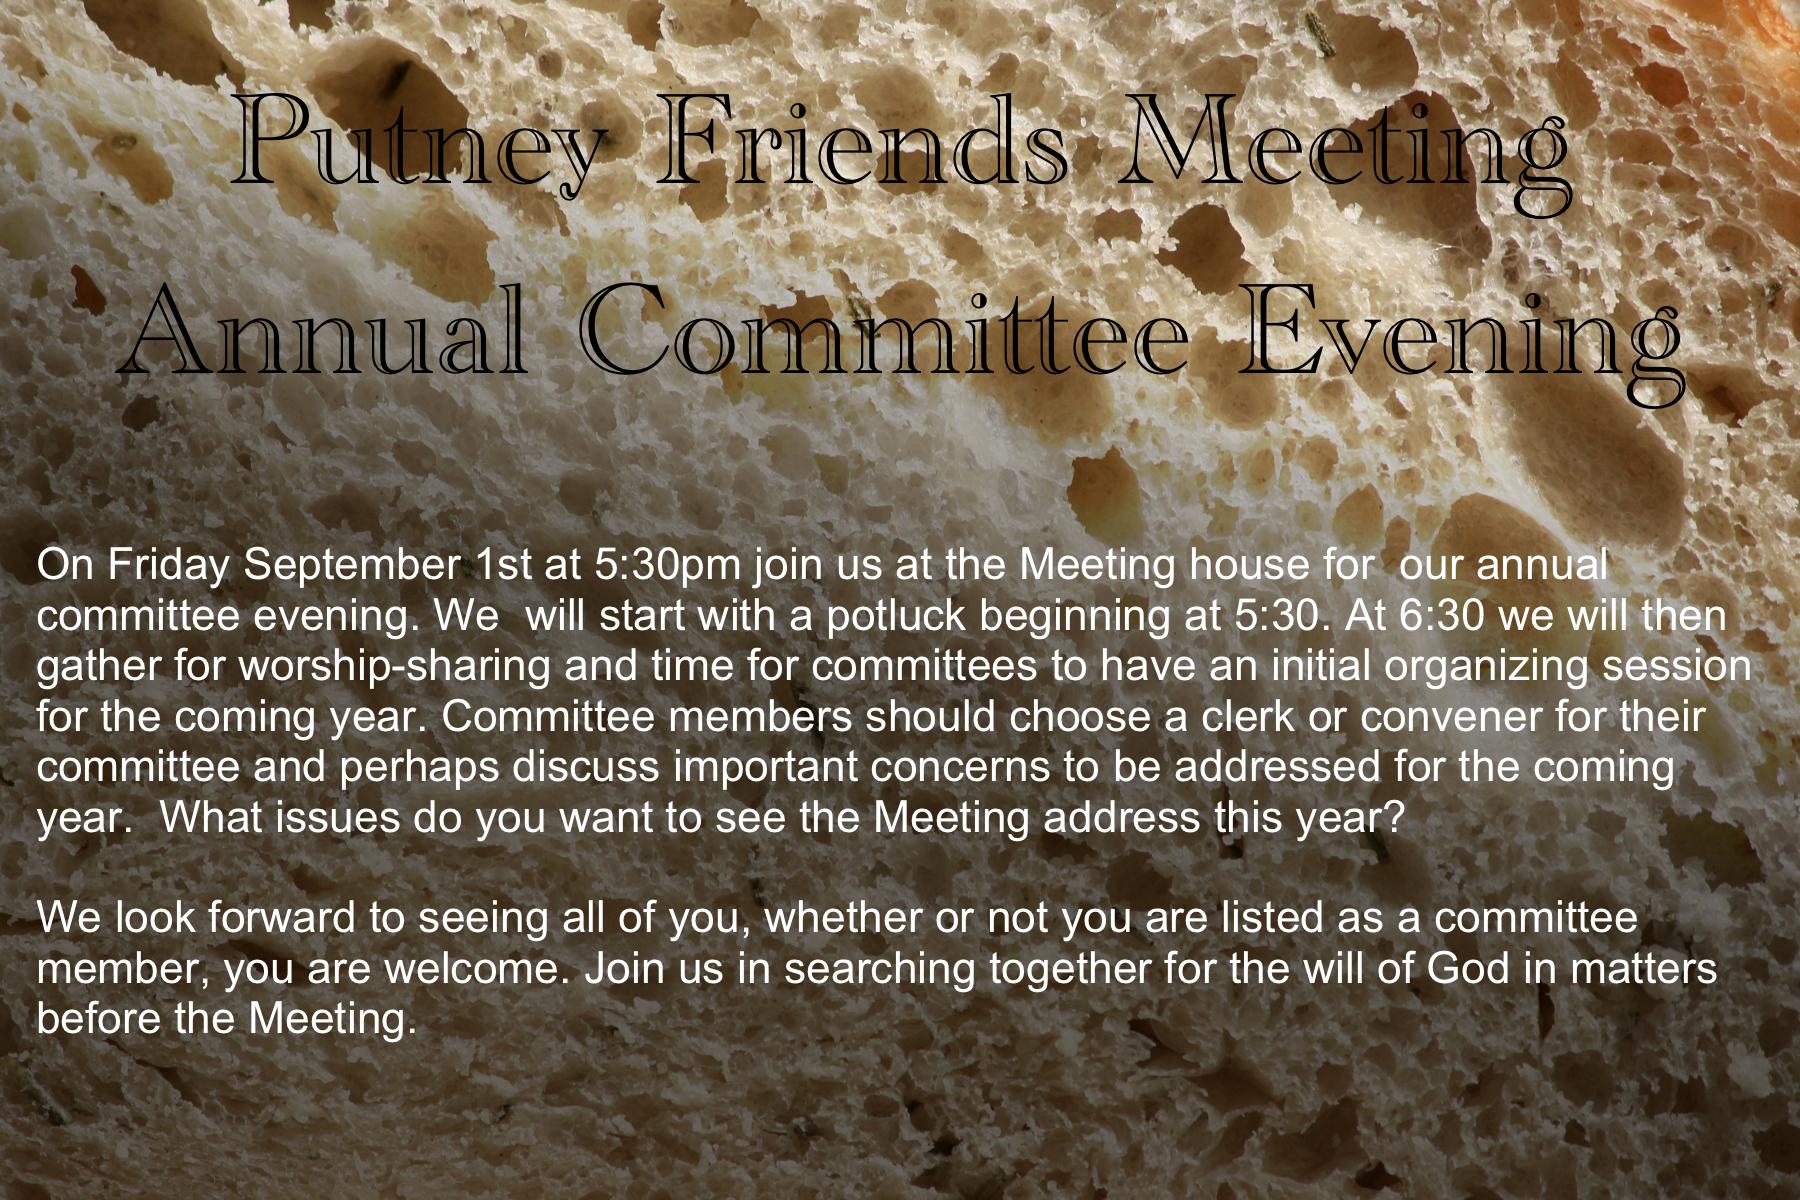 PFM Committee Evening